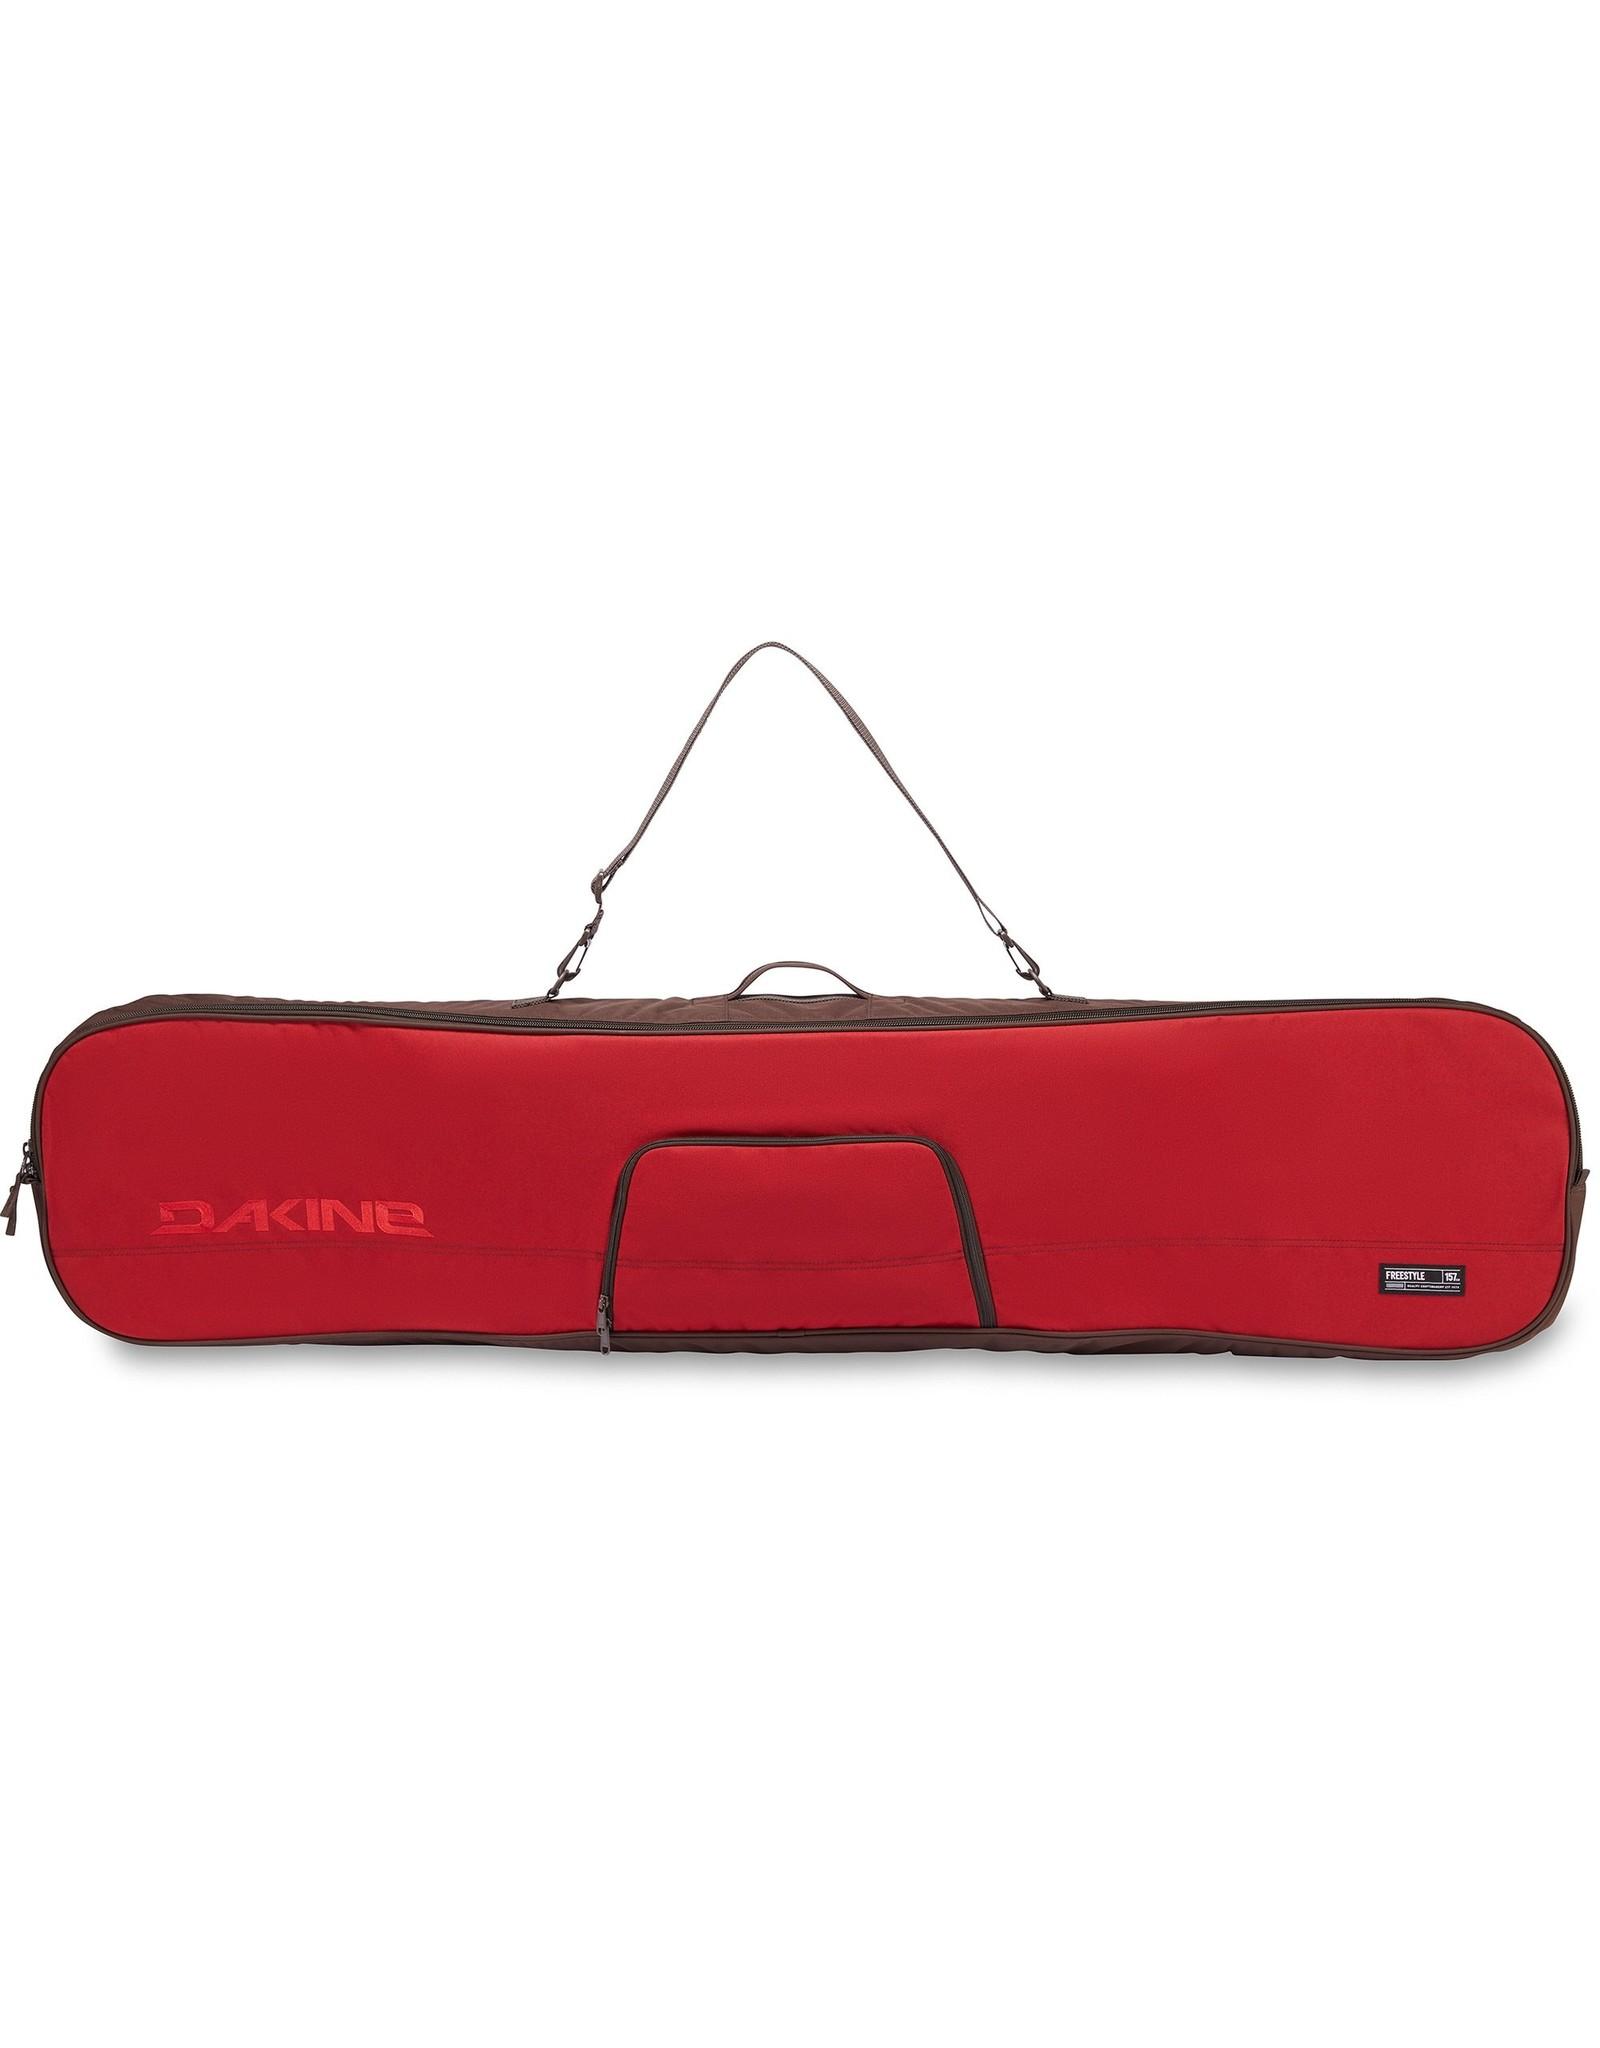 DAKINE DAKINE - FREESTYLE BAG - 157CM - RED